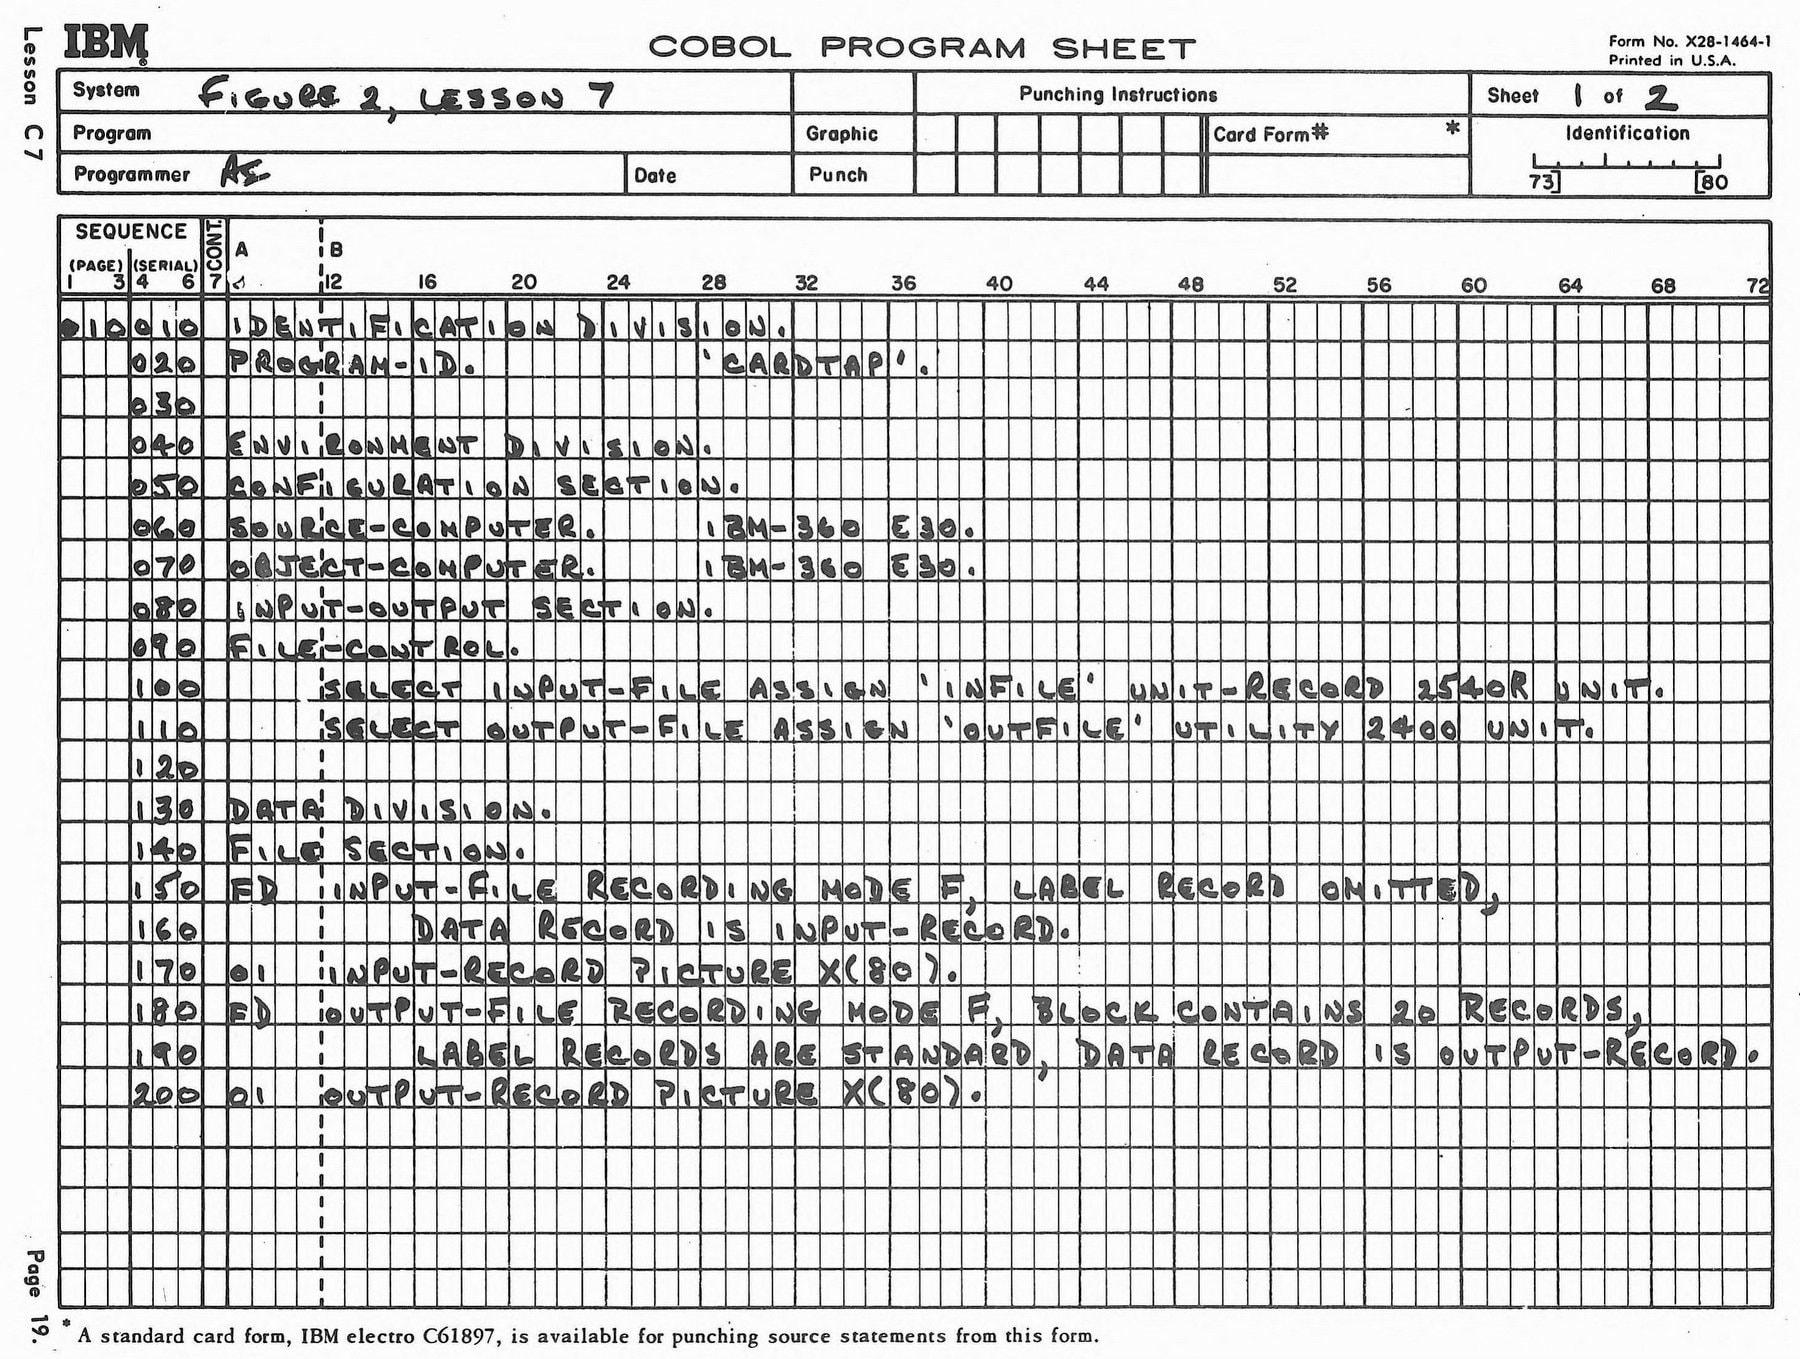 Vintage 60s COBOL computer programming sheets (1)